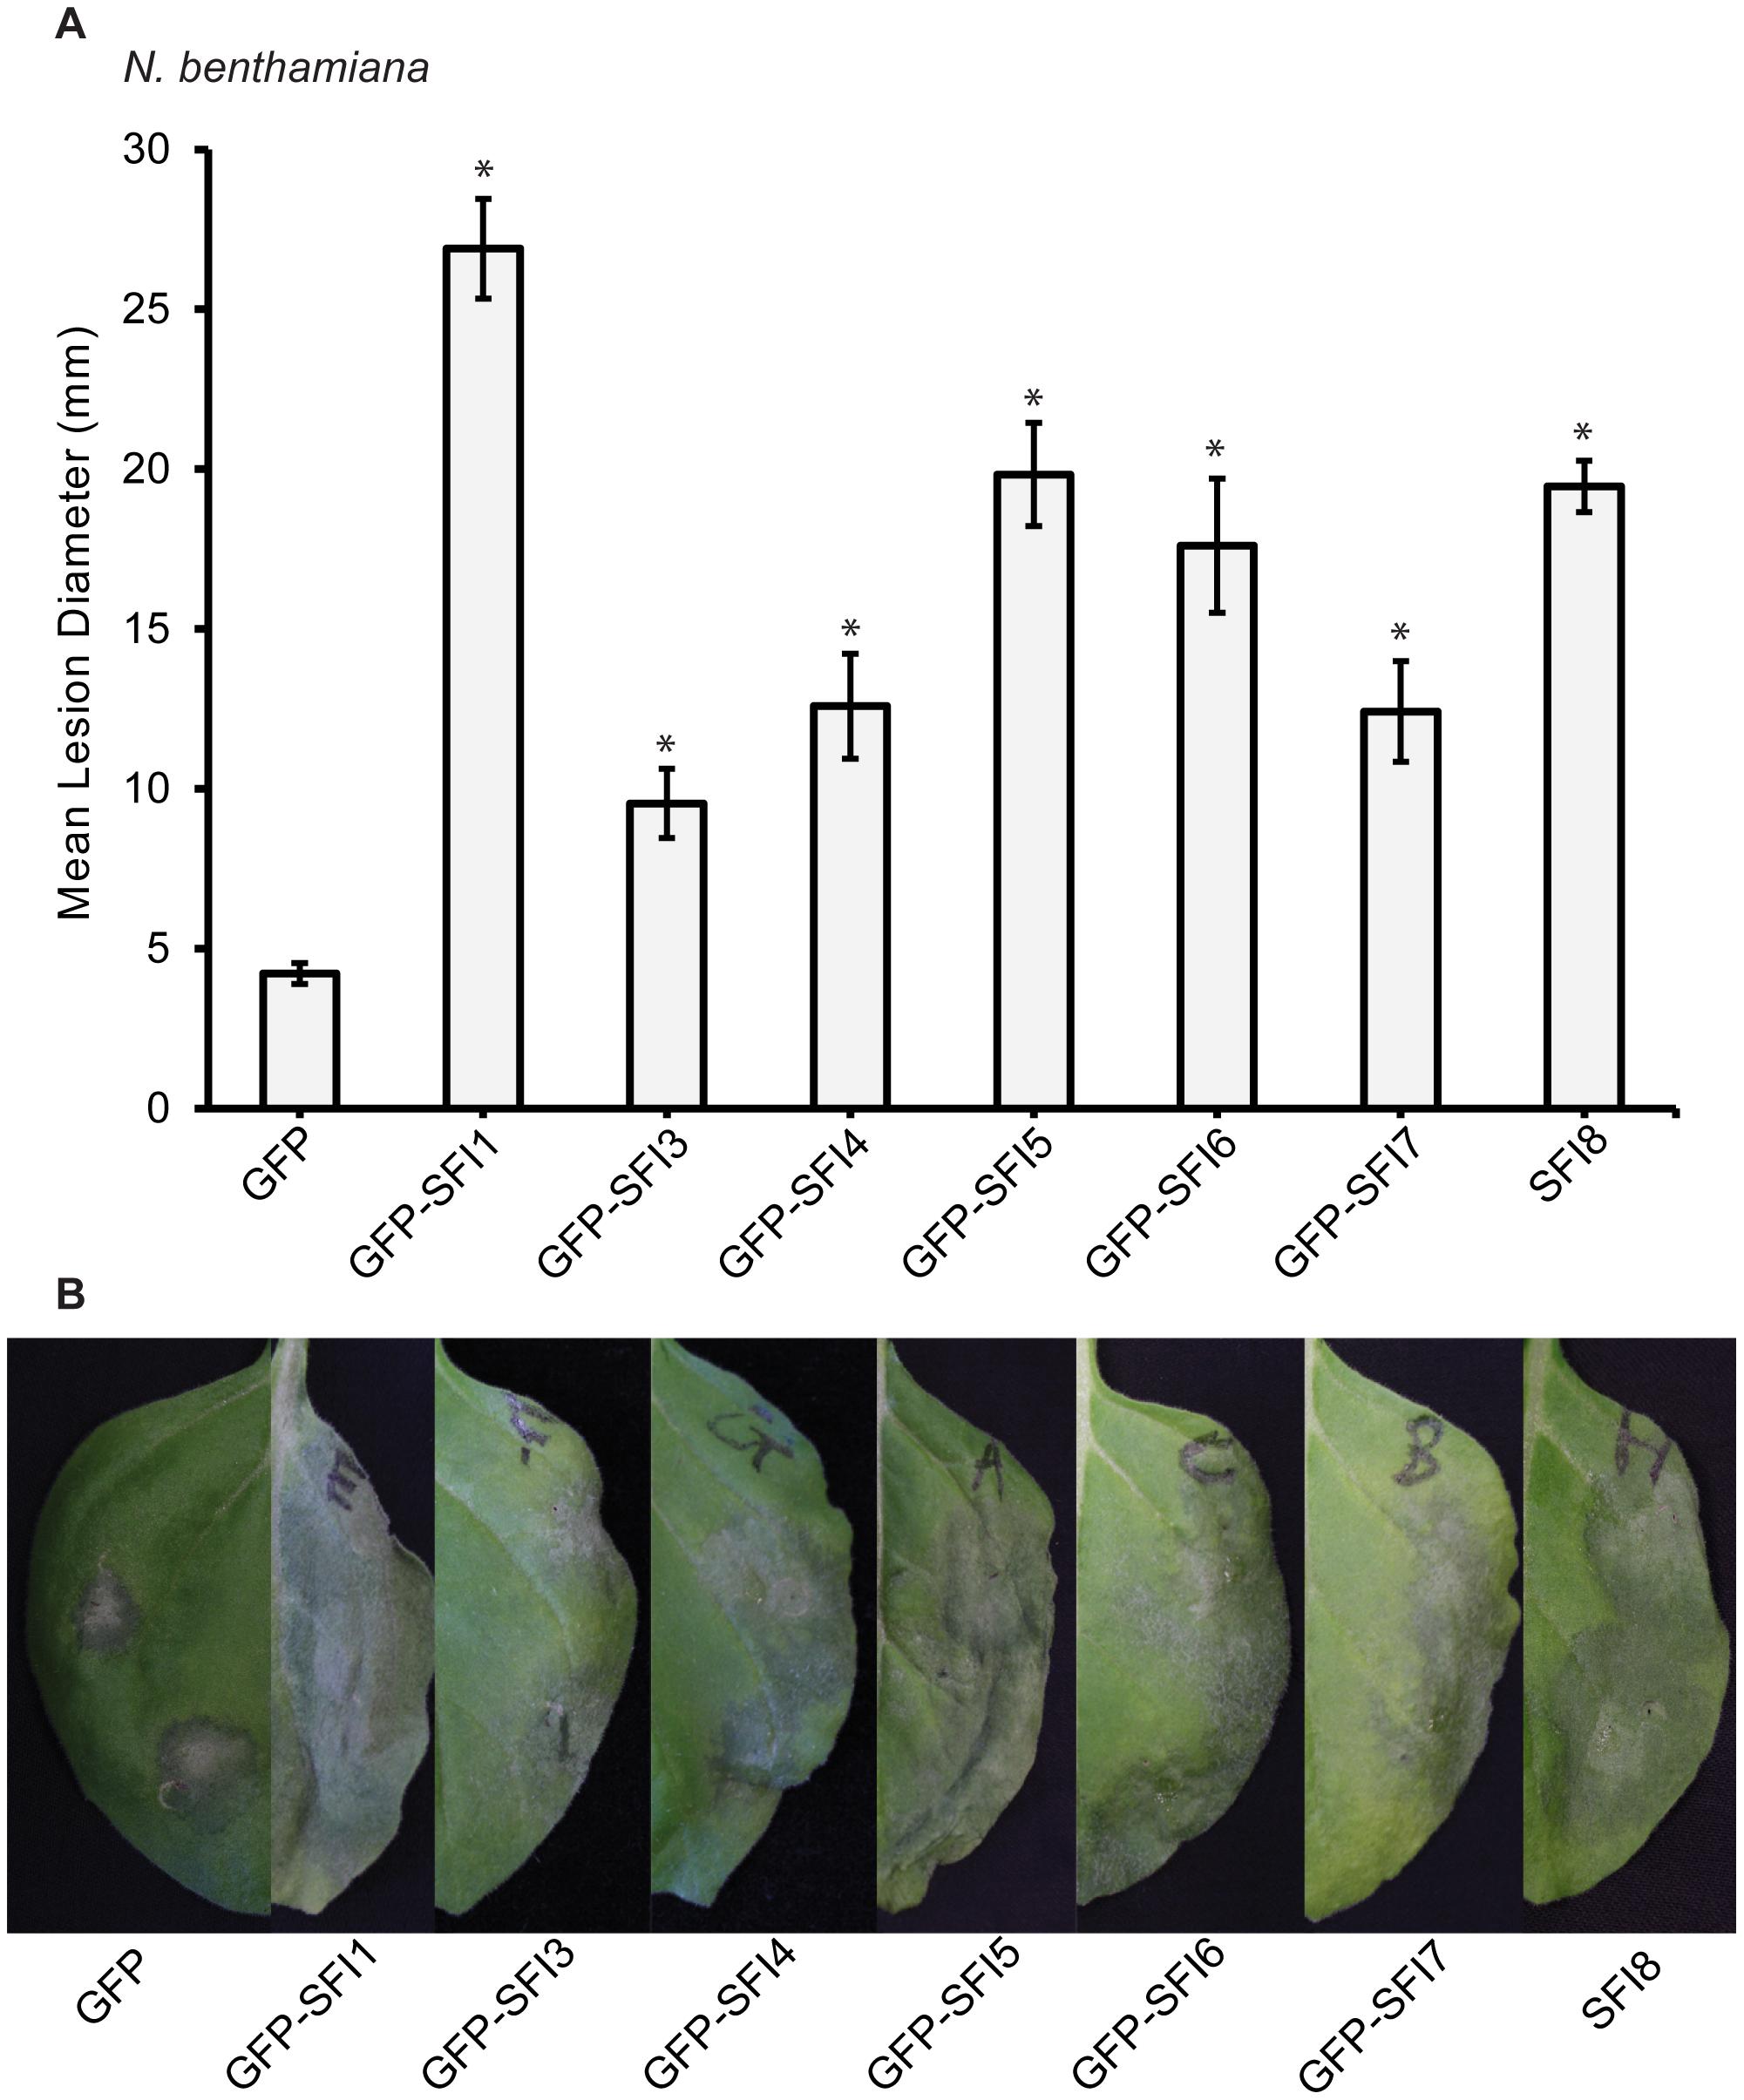 Effect of transient expression of SFI effectors enhances <i>P. infestans</i> colonization of <i>N. benthamiana</i>.